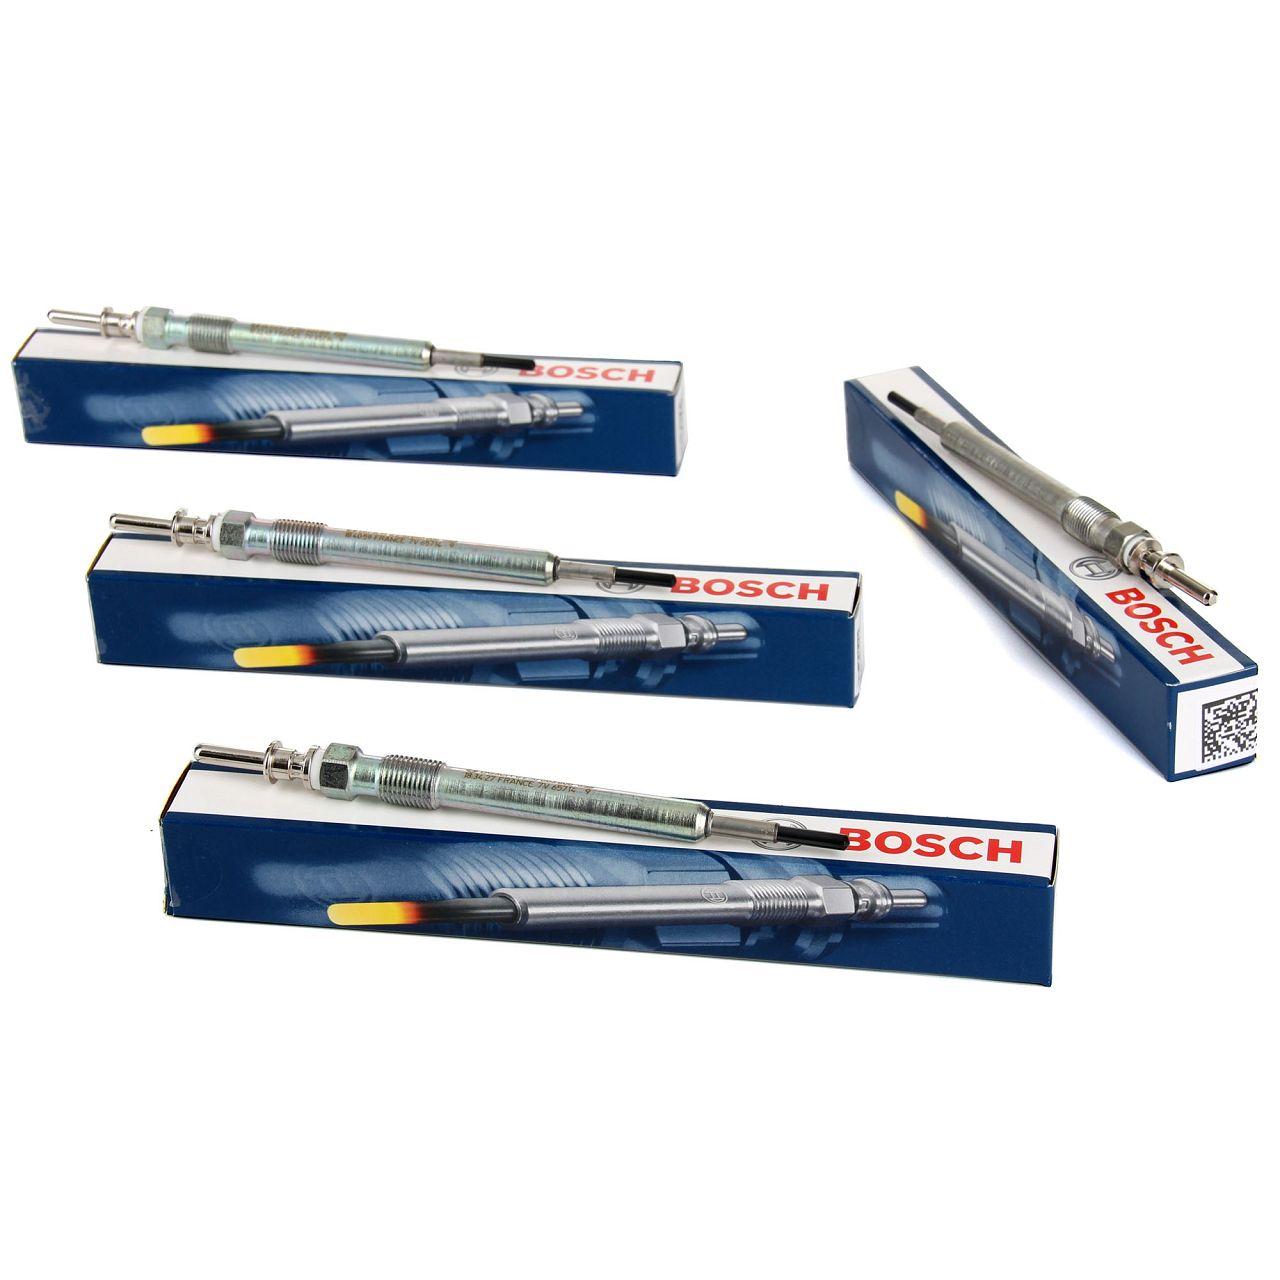 4x BOSCH GLP173 0250603006 Glühkerze für BMW MINI 4-Zylinder N47 B47 12230035934